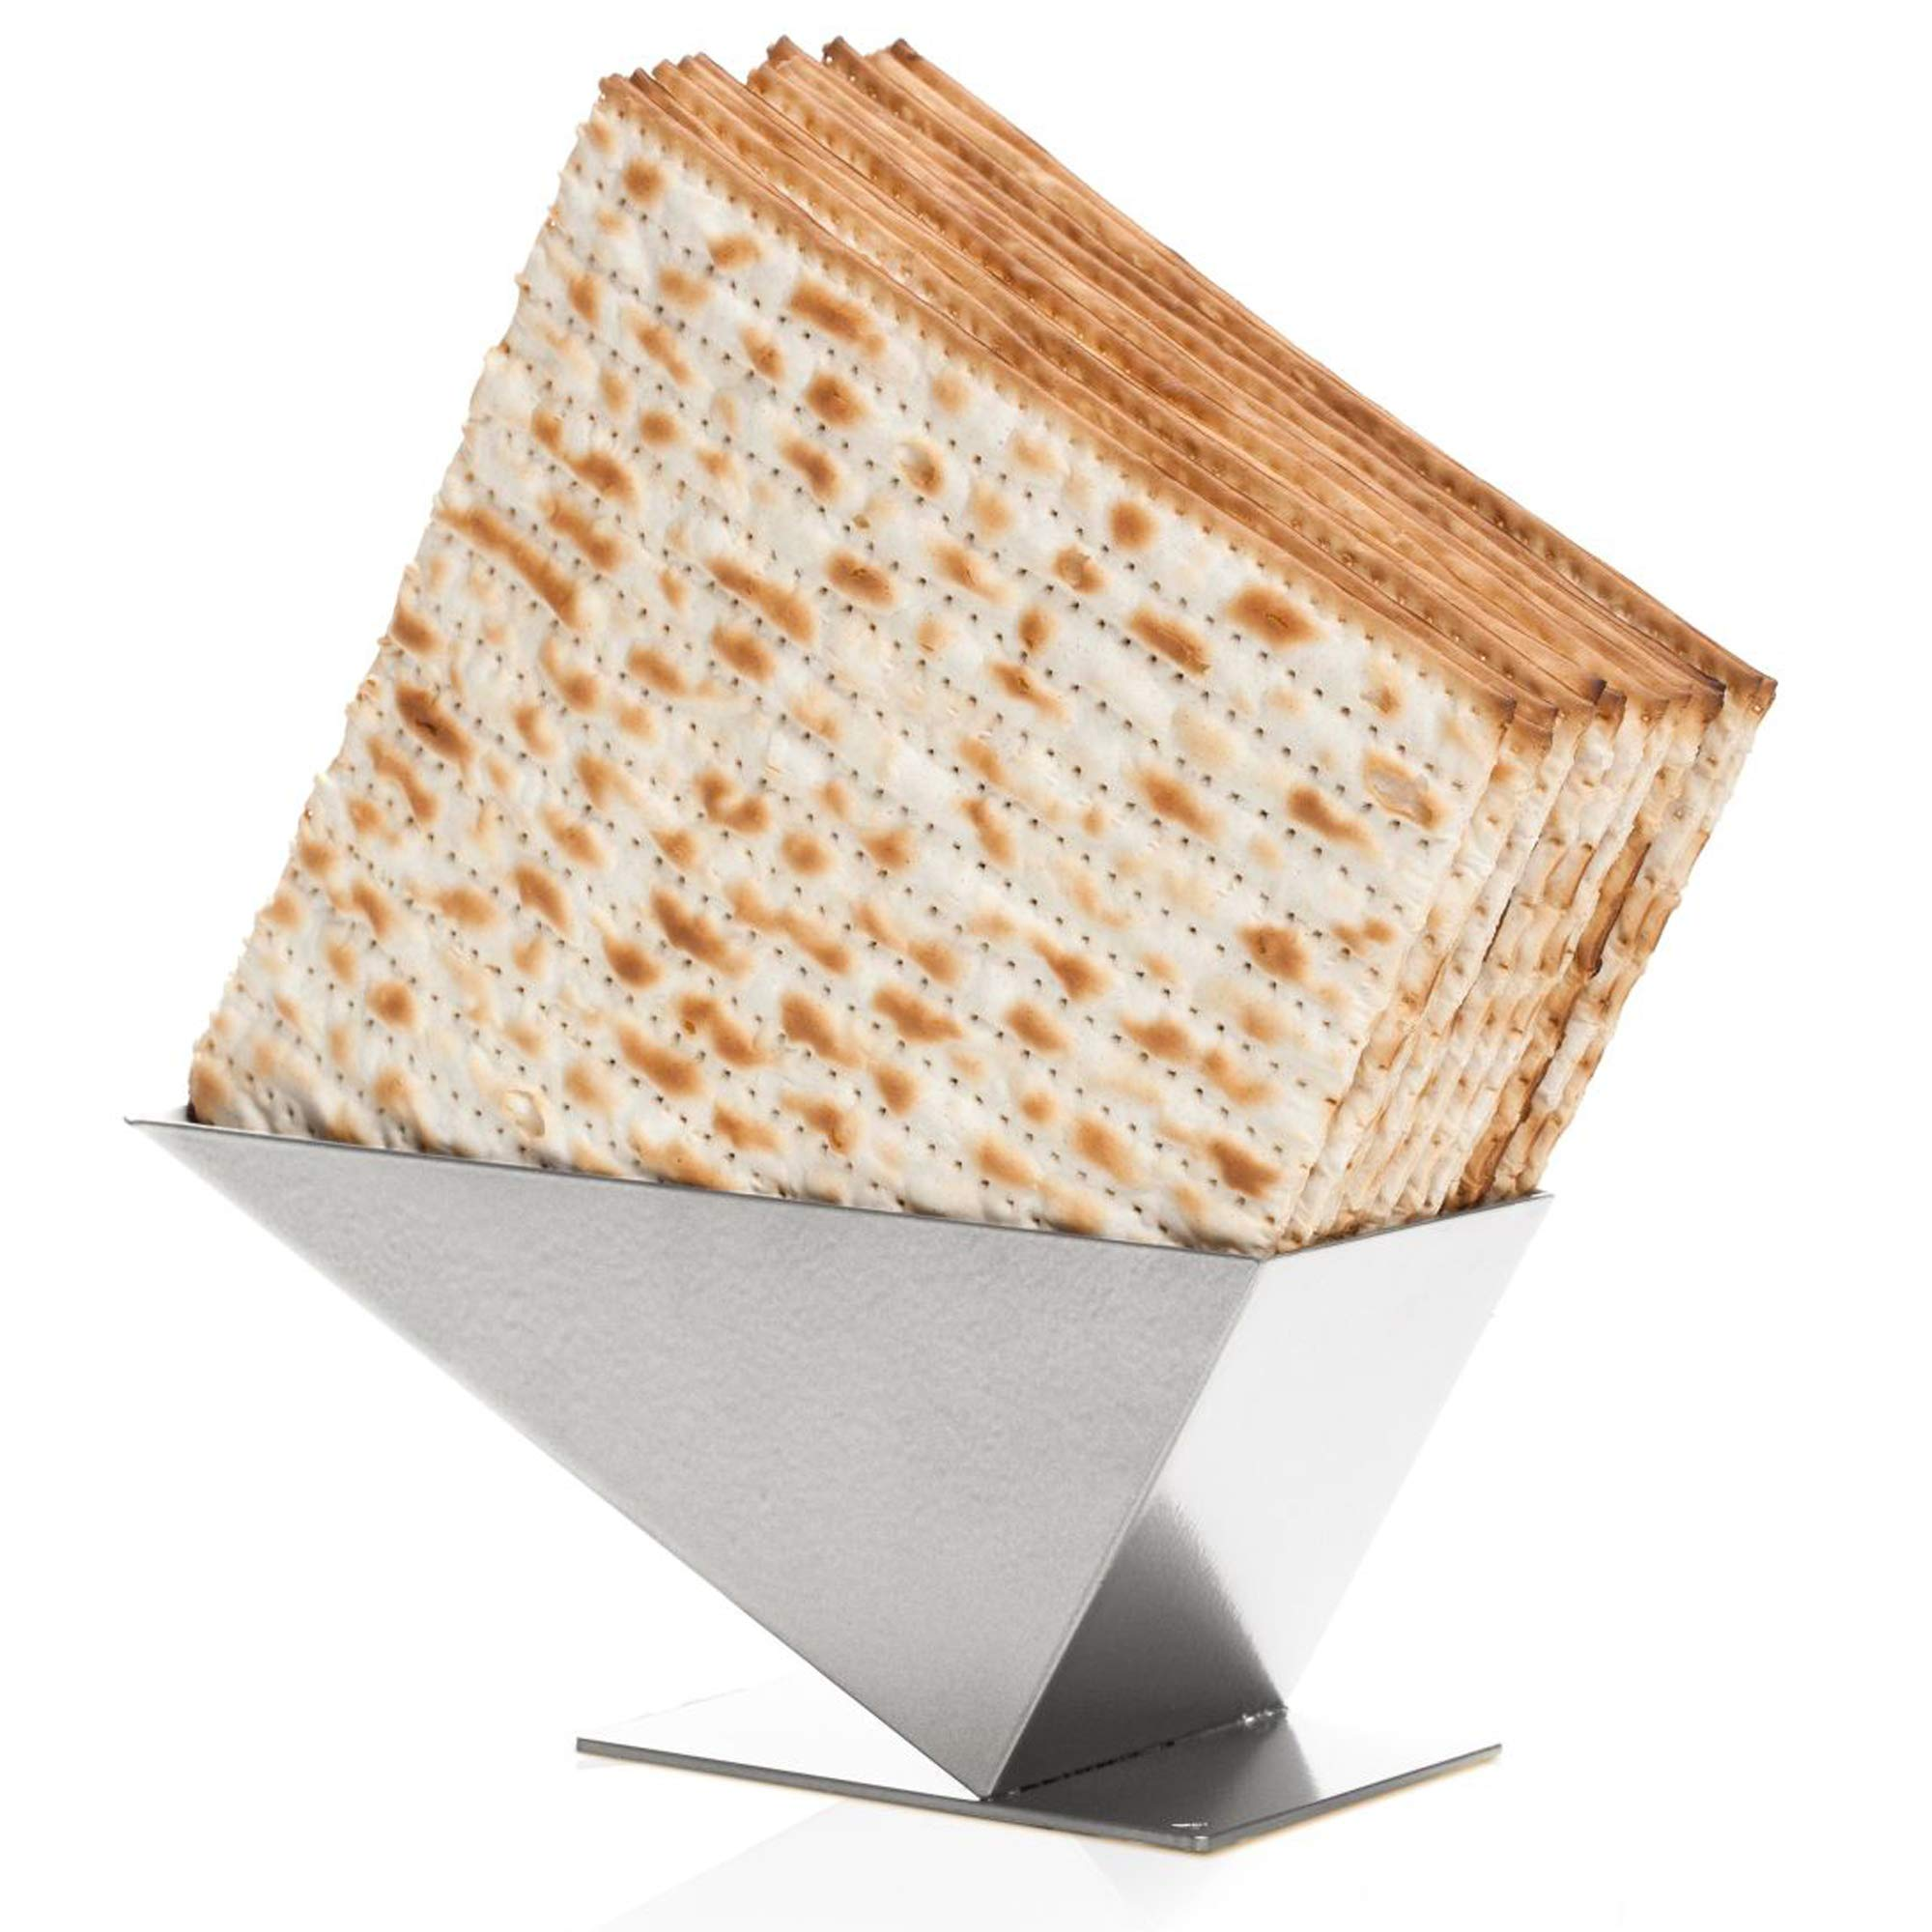 Matzah Crackers Holder - Passover Decorations Matzos Crackers Tray for Kitchen Storage - Dinner Table Decoration Matzah Box, Matzah Holder for Seder Table Design, Pyramid Matzo Holder